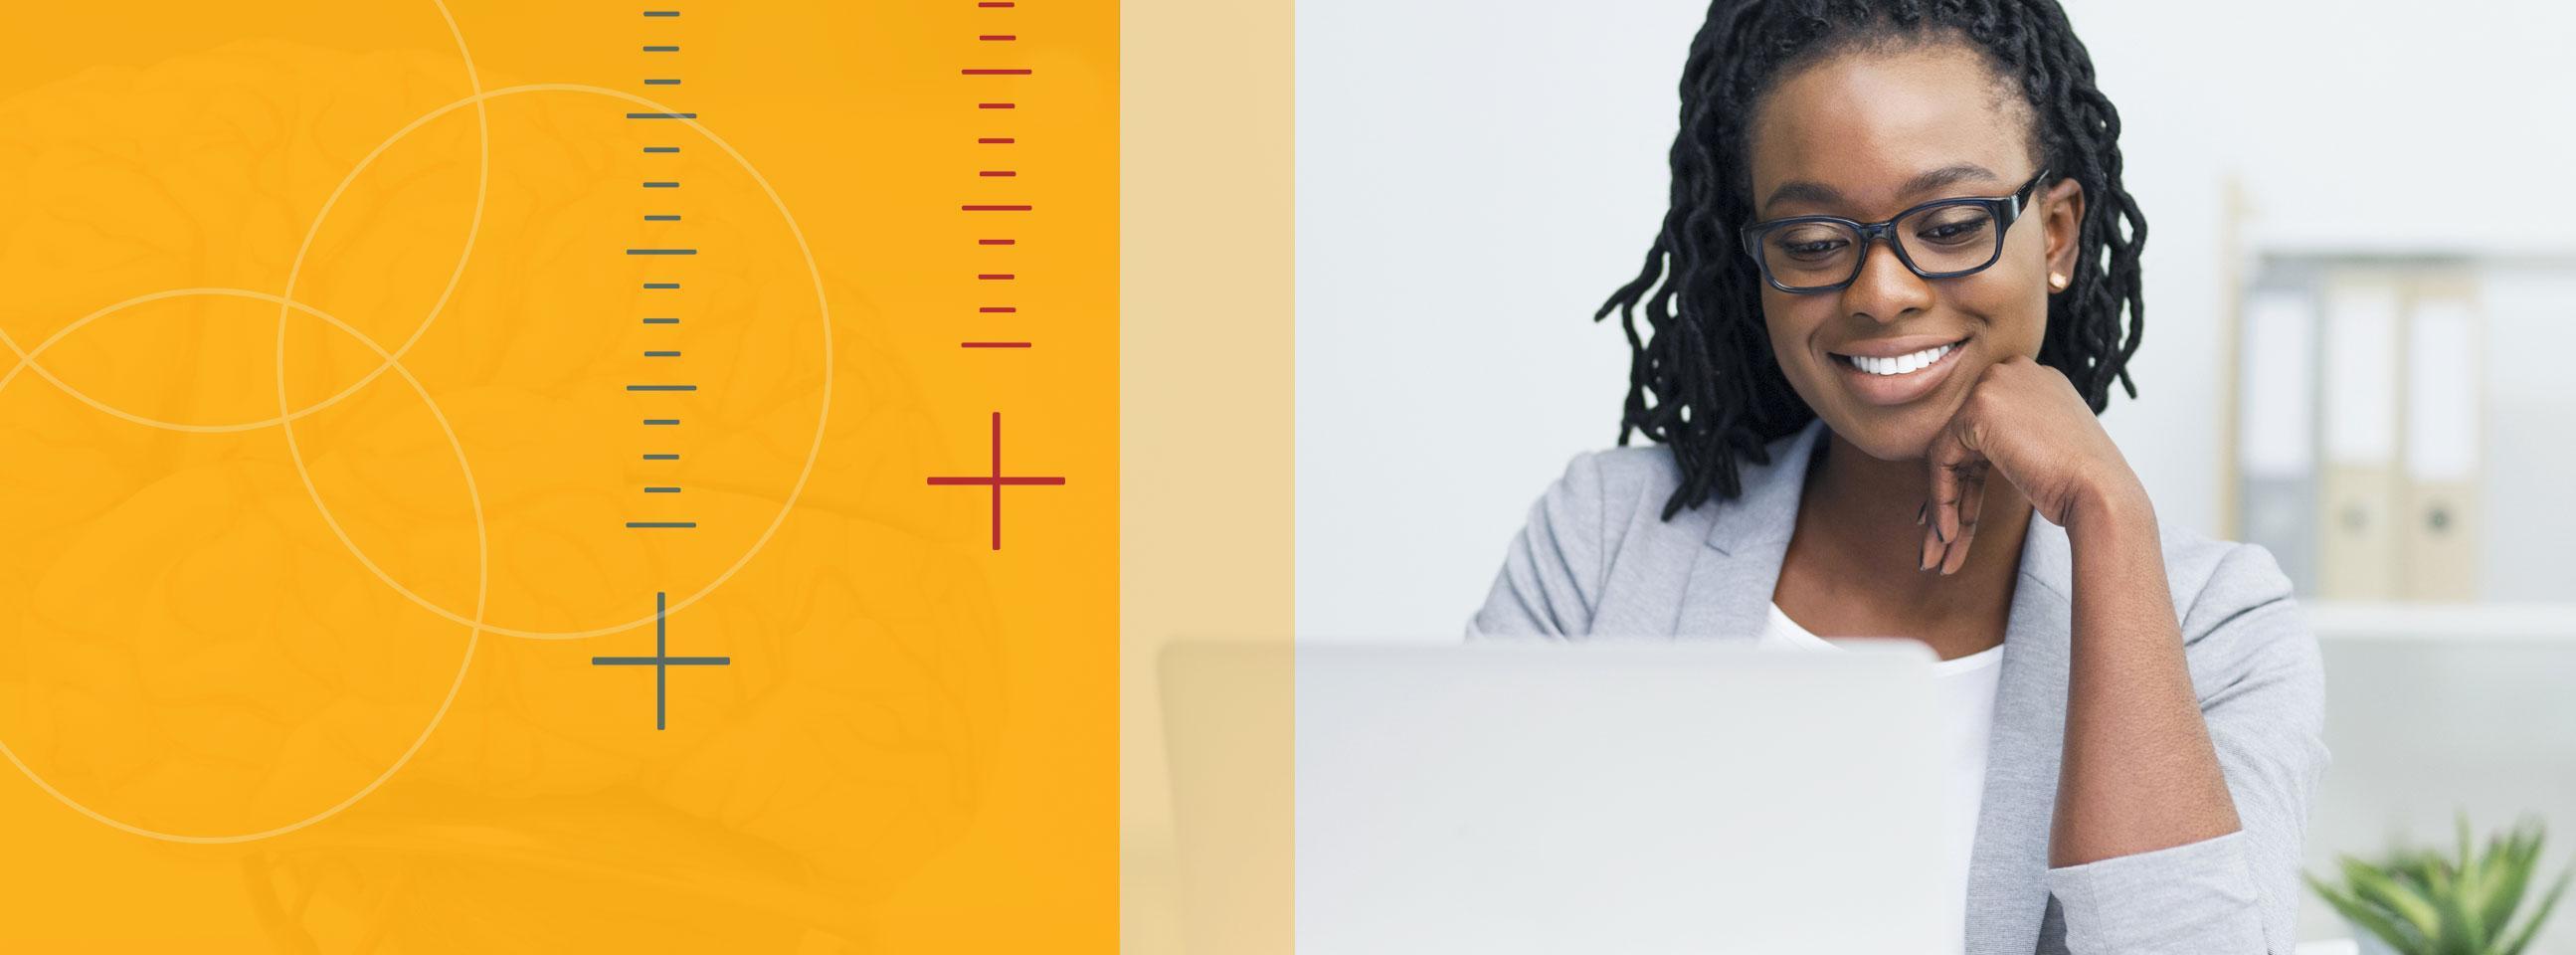 aba certification online free